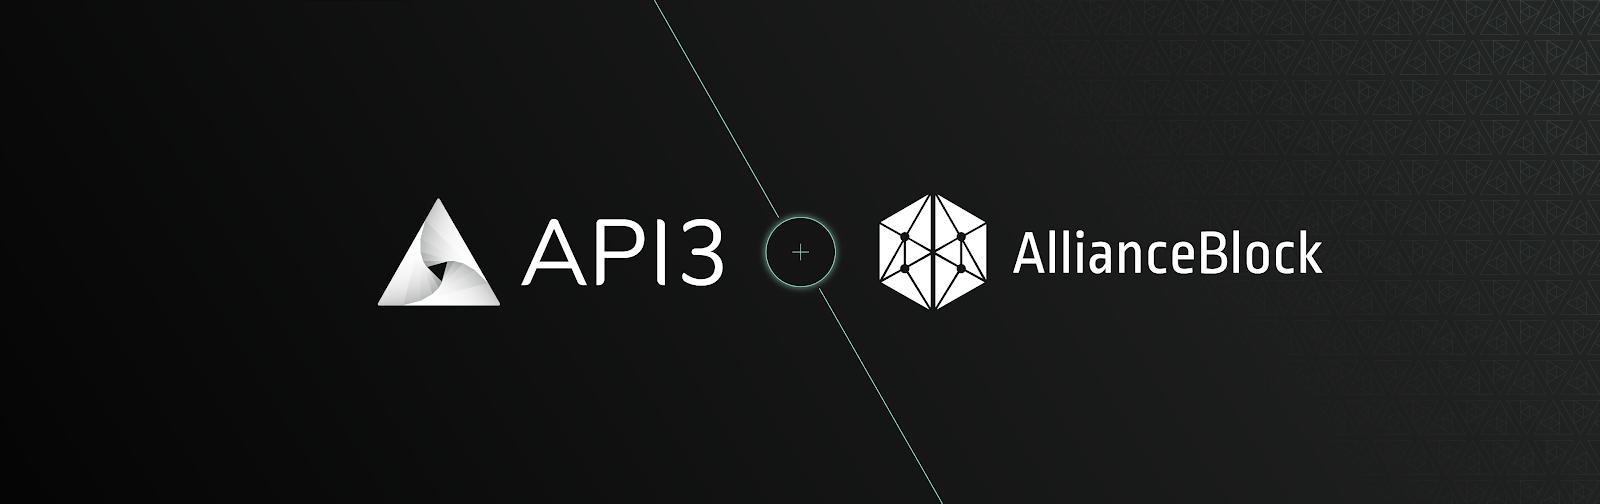 API3 与 AllianceBlock 达成合作伙伴关系并宣布合作计划